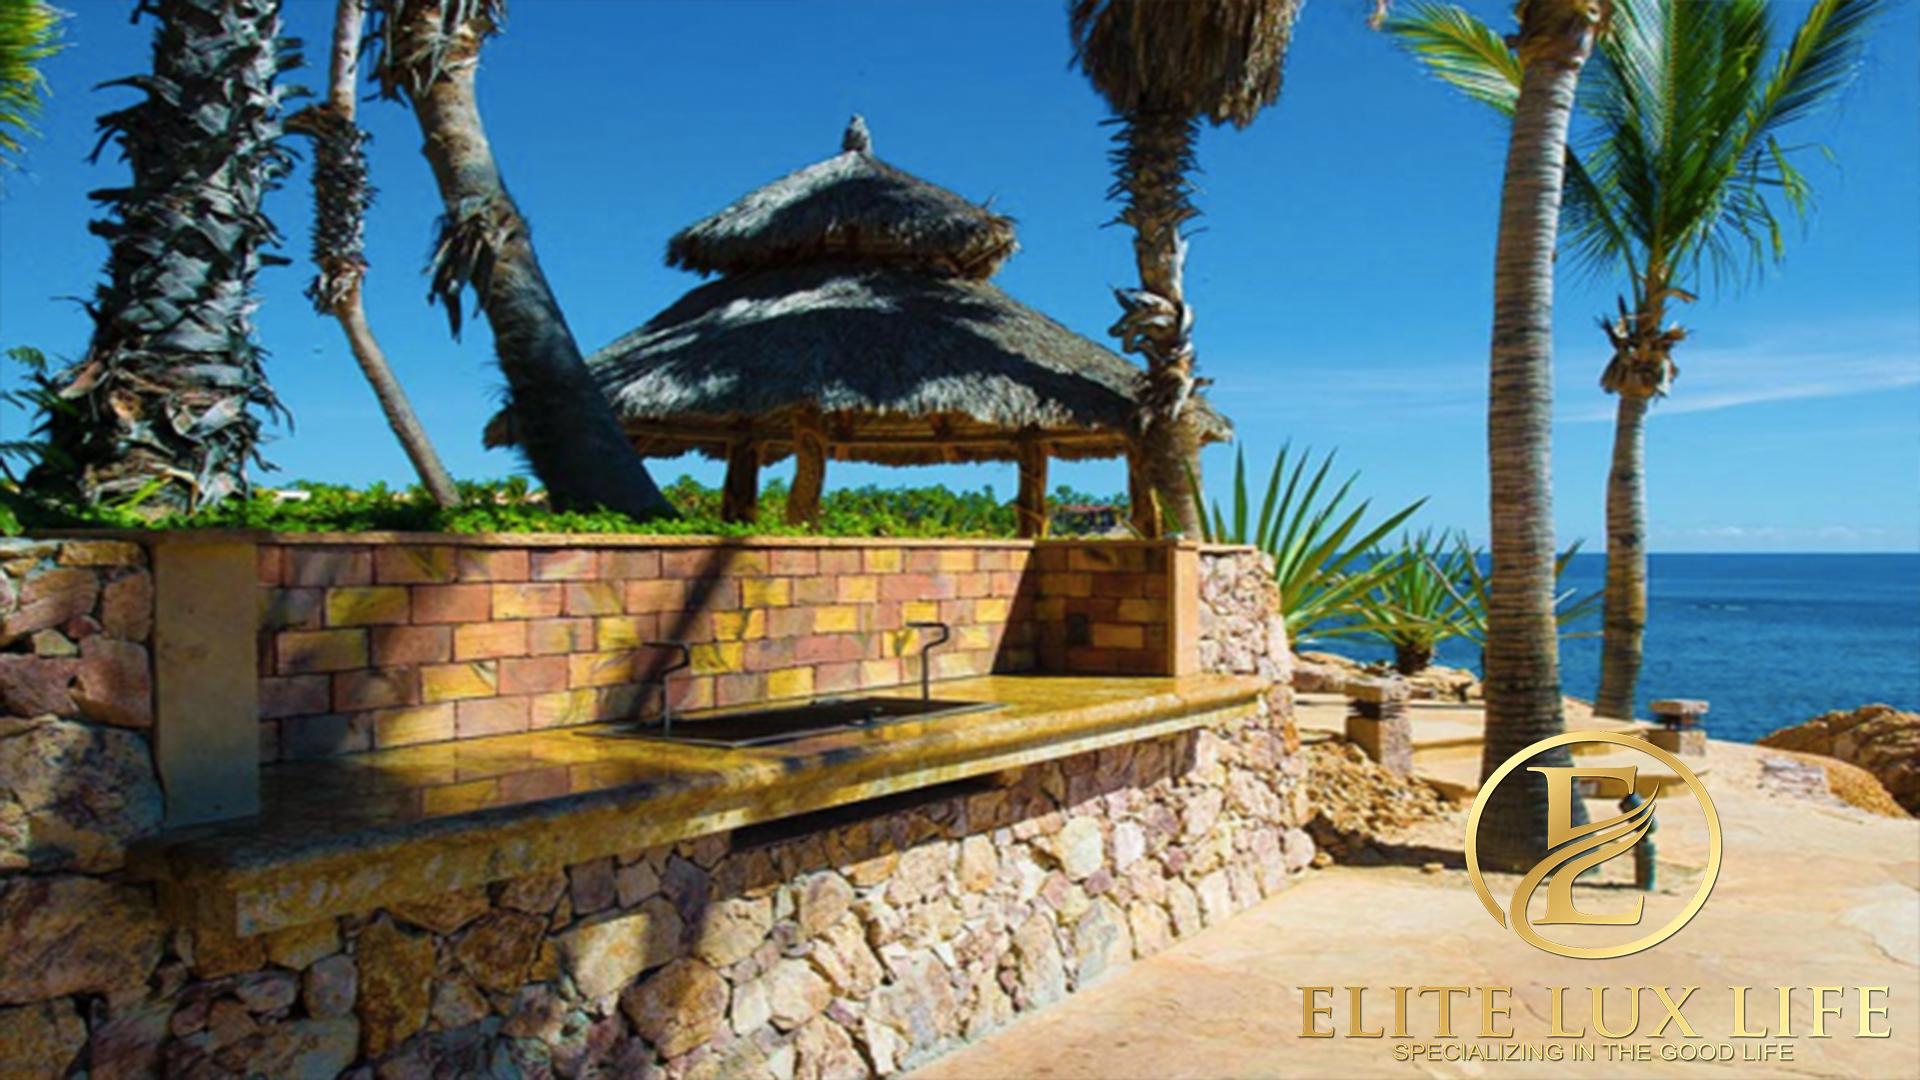 Elite Villa Cielito 3